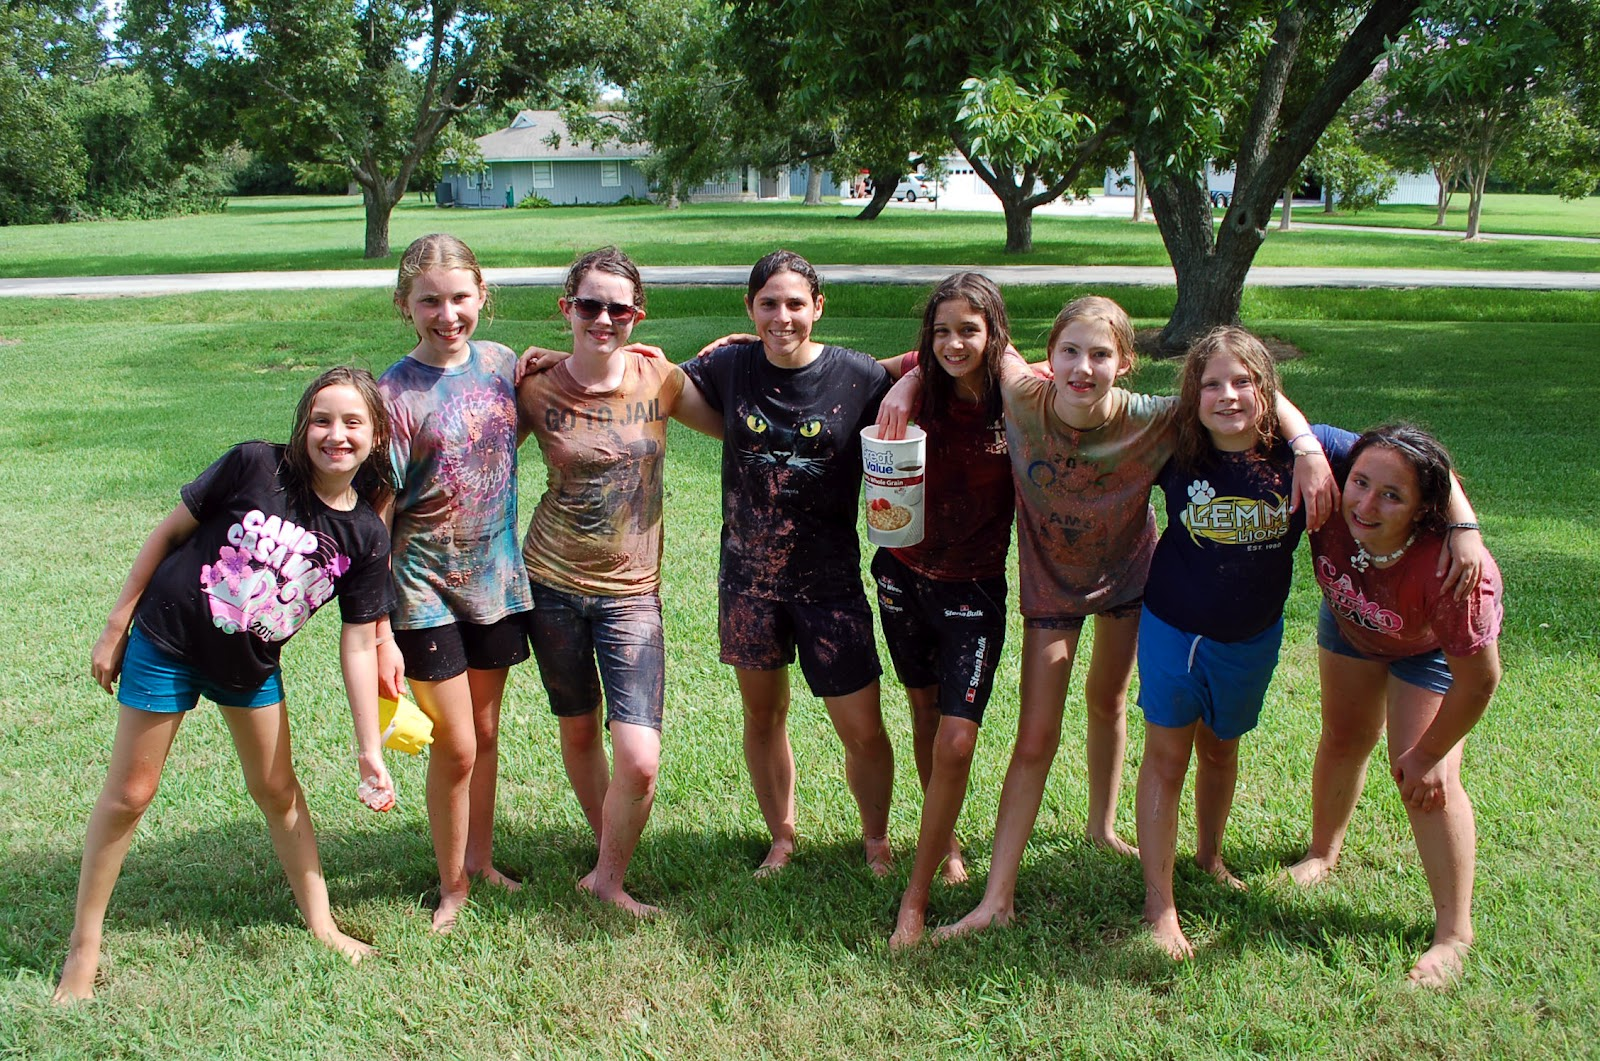 Girl Scouts of San Jacinto Council Blog: Photoblog: A return to ...: gssjc.blogspot.com/2012/07/photoblog-return-to-resident-camp.html